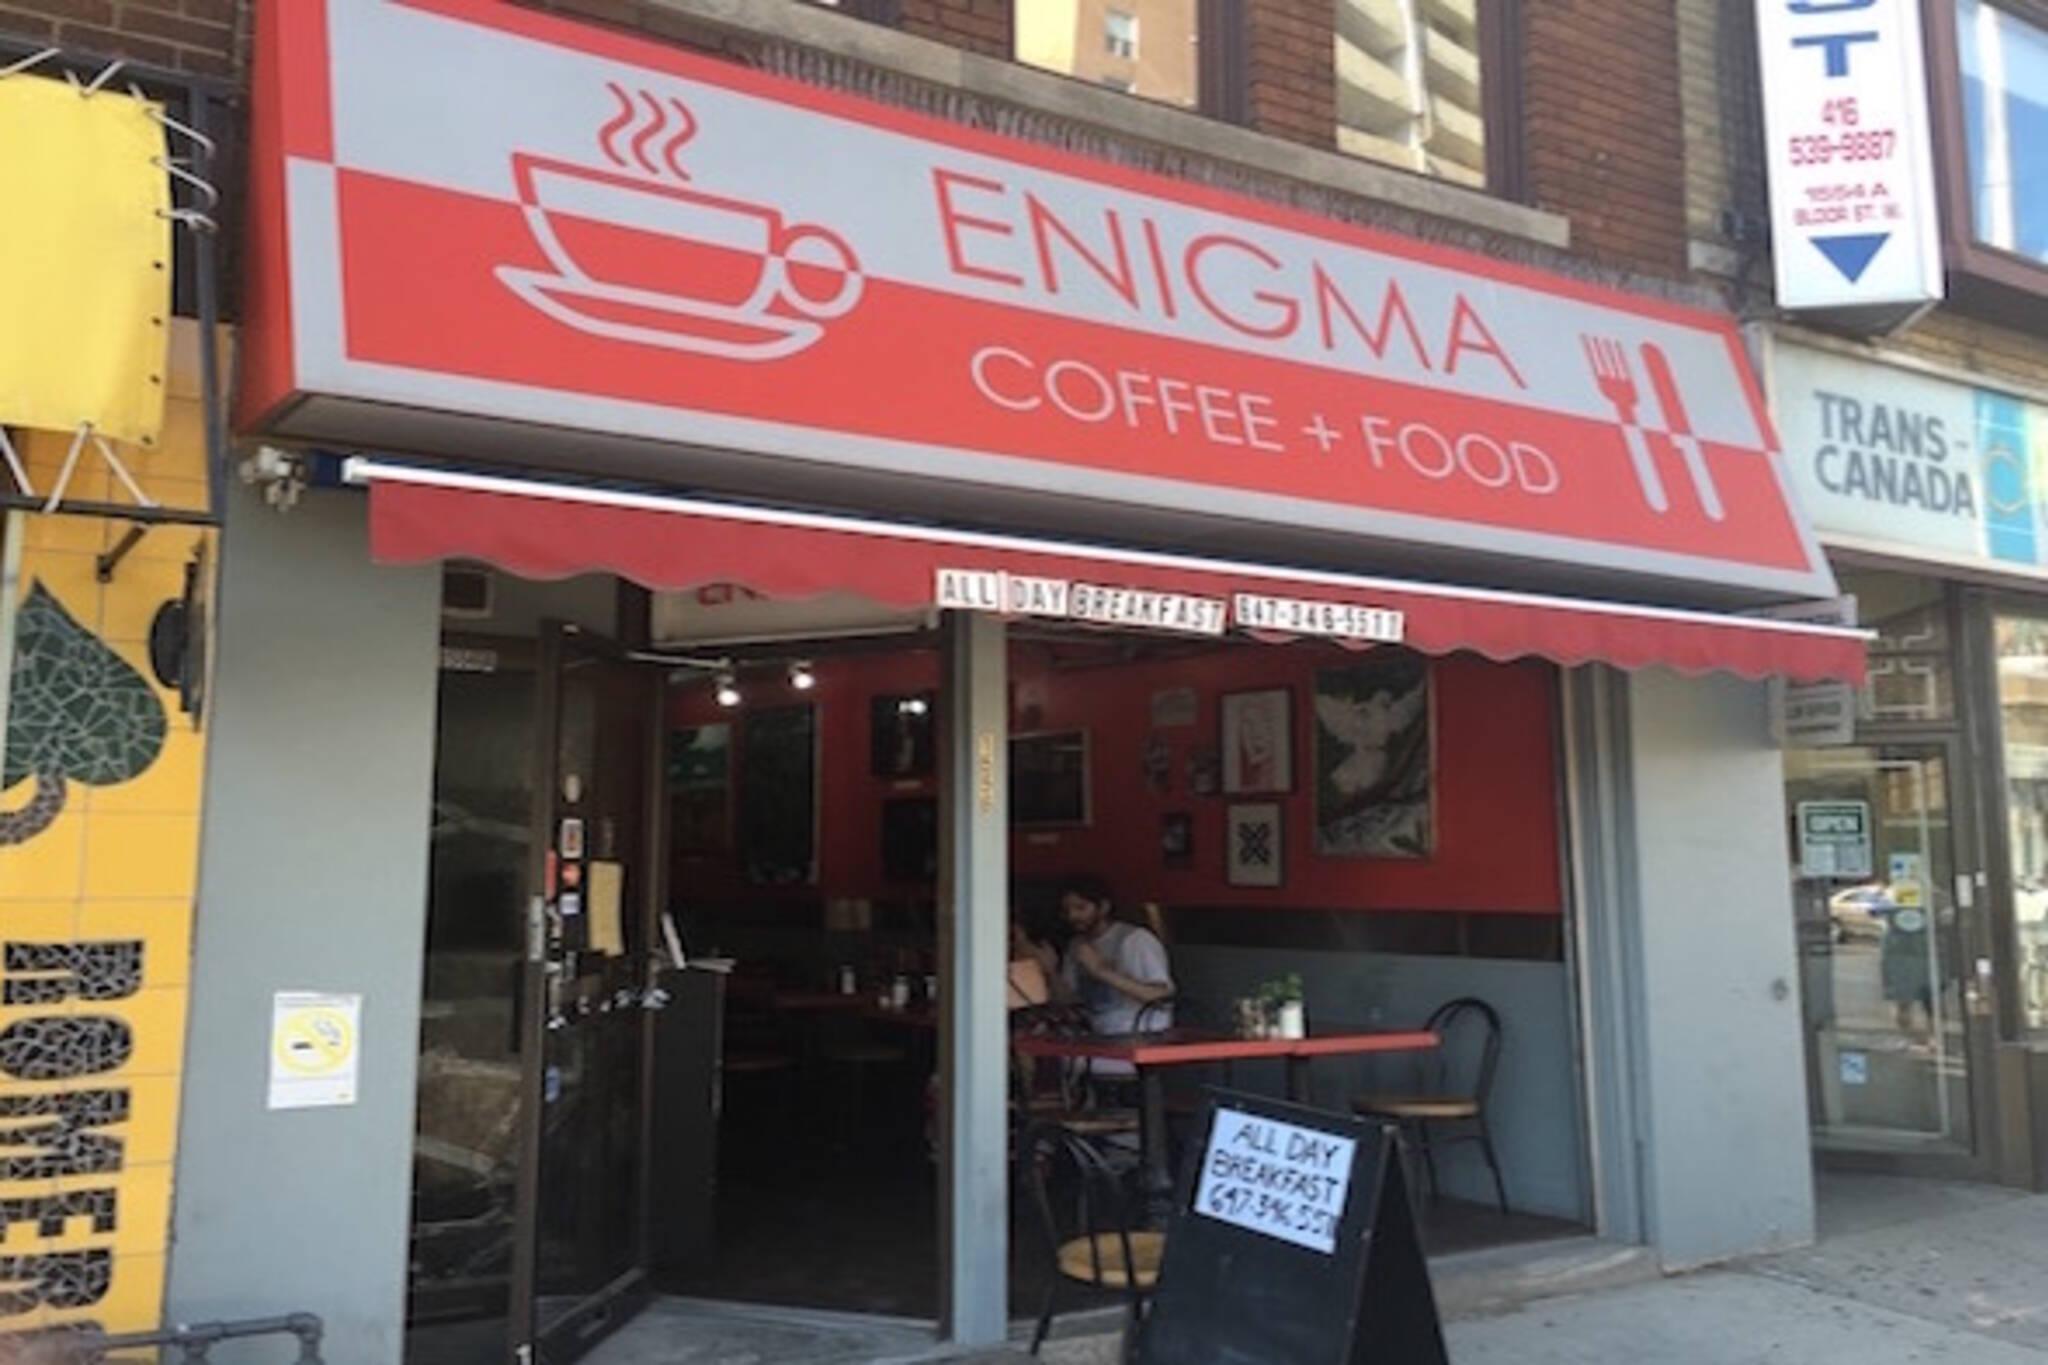 Enigma Coffee and Food Toronto